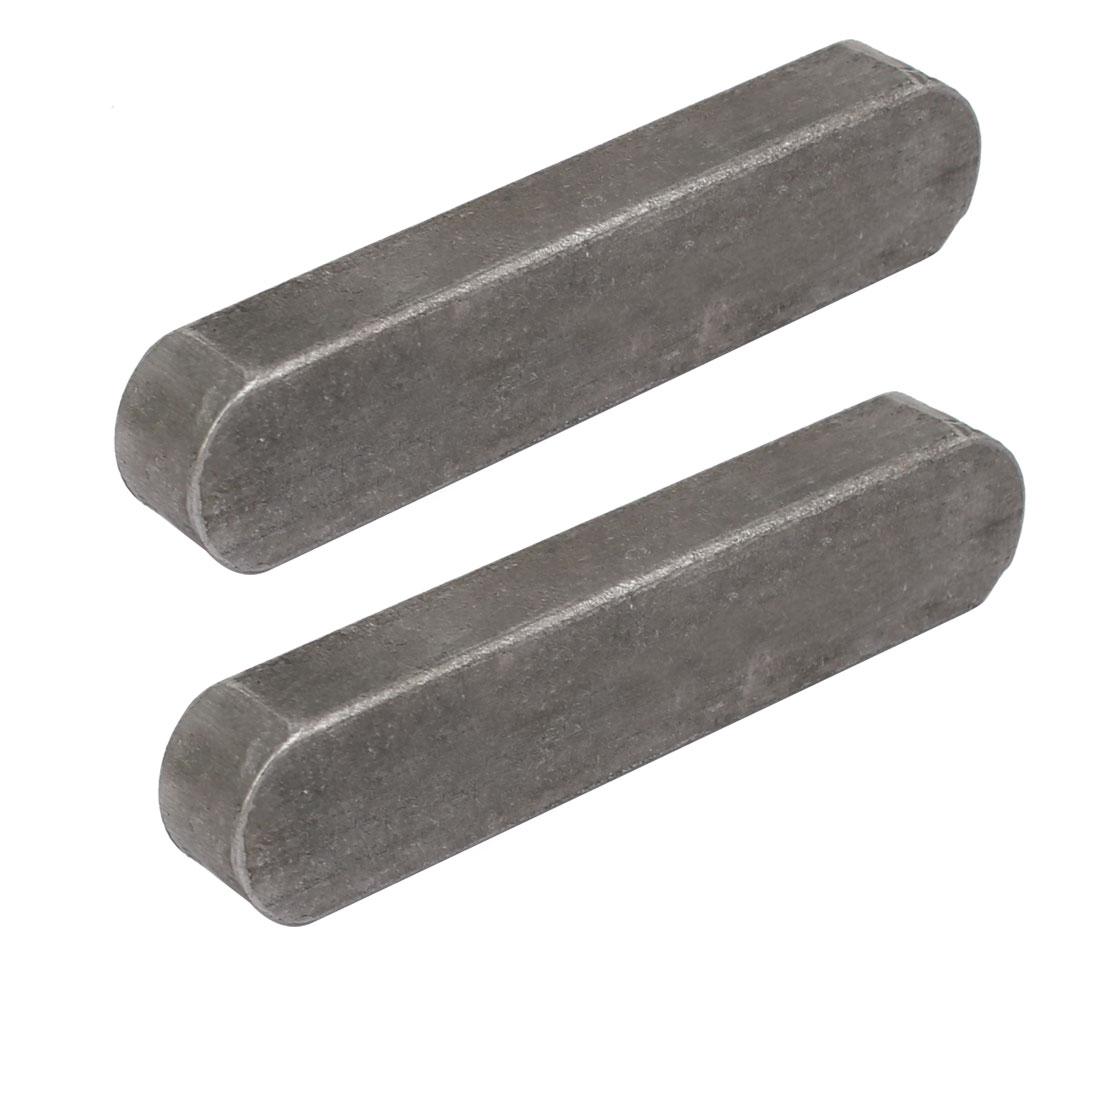 65mmx14mmx9mm Carbon Steel Key Stock To Lock Pulleys 2pcs